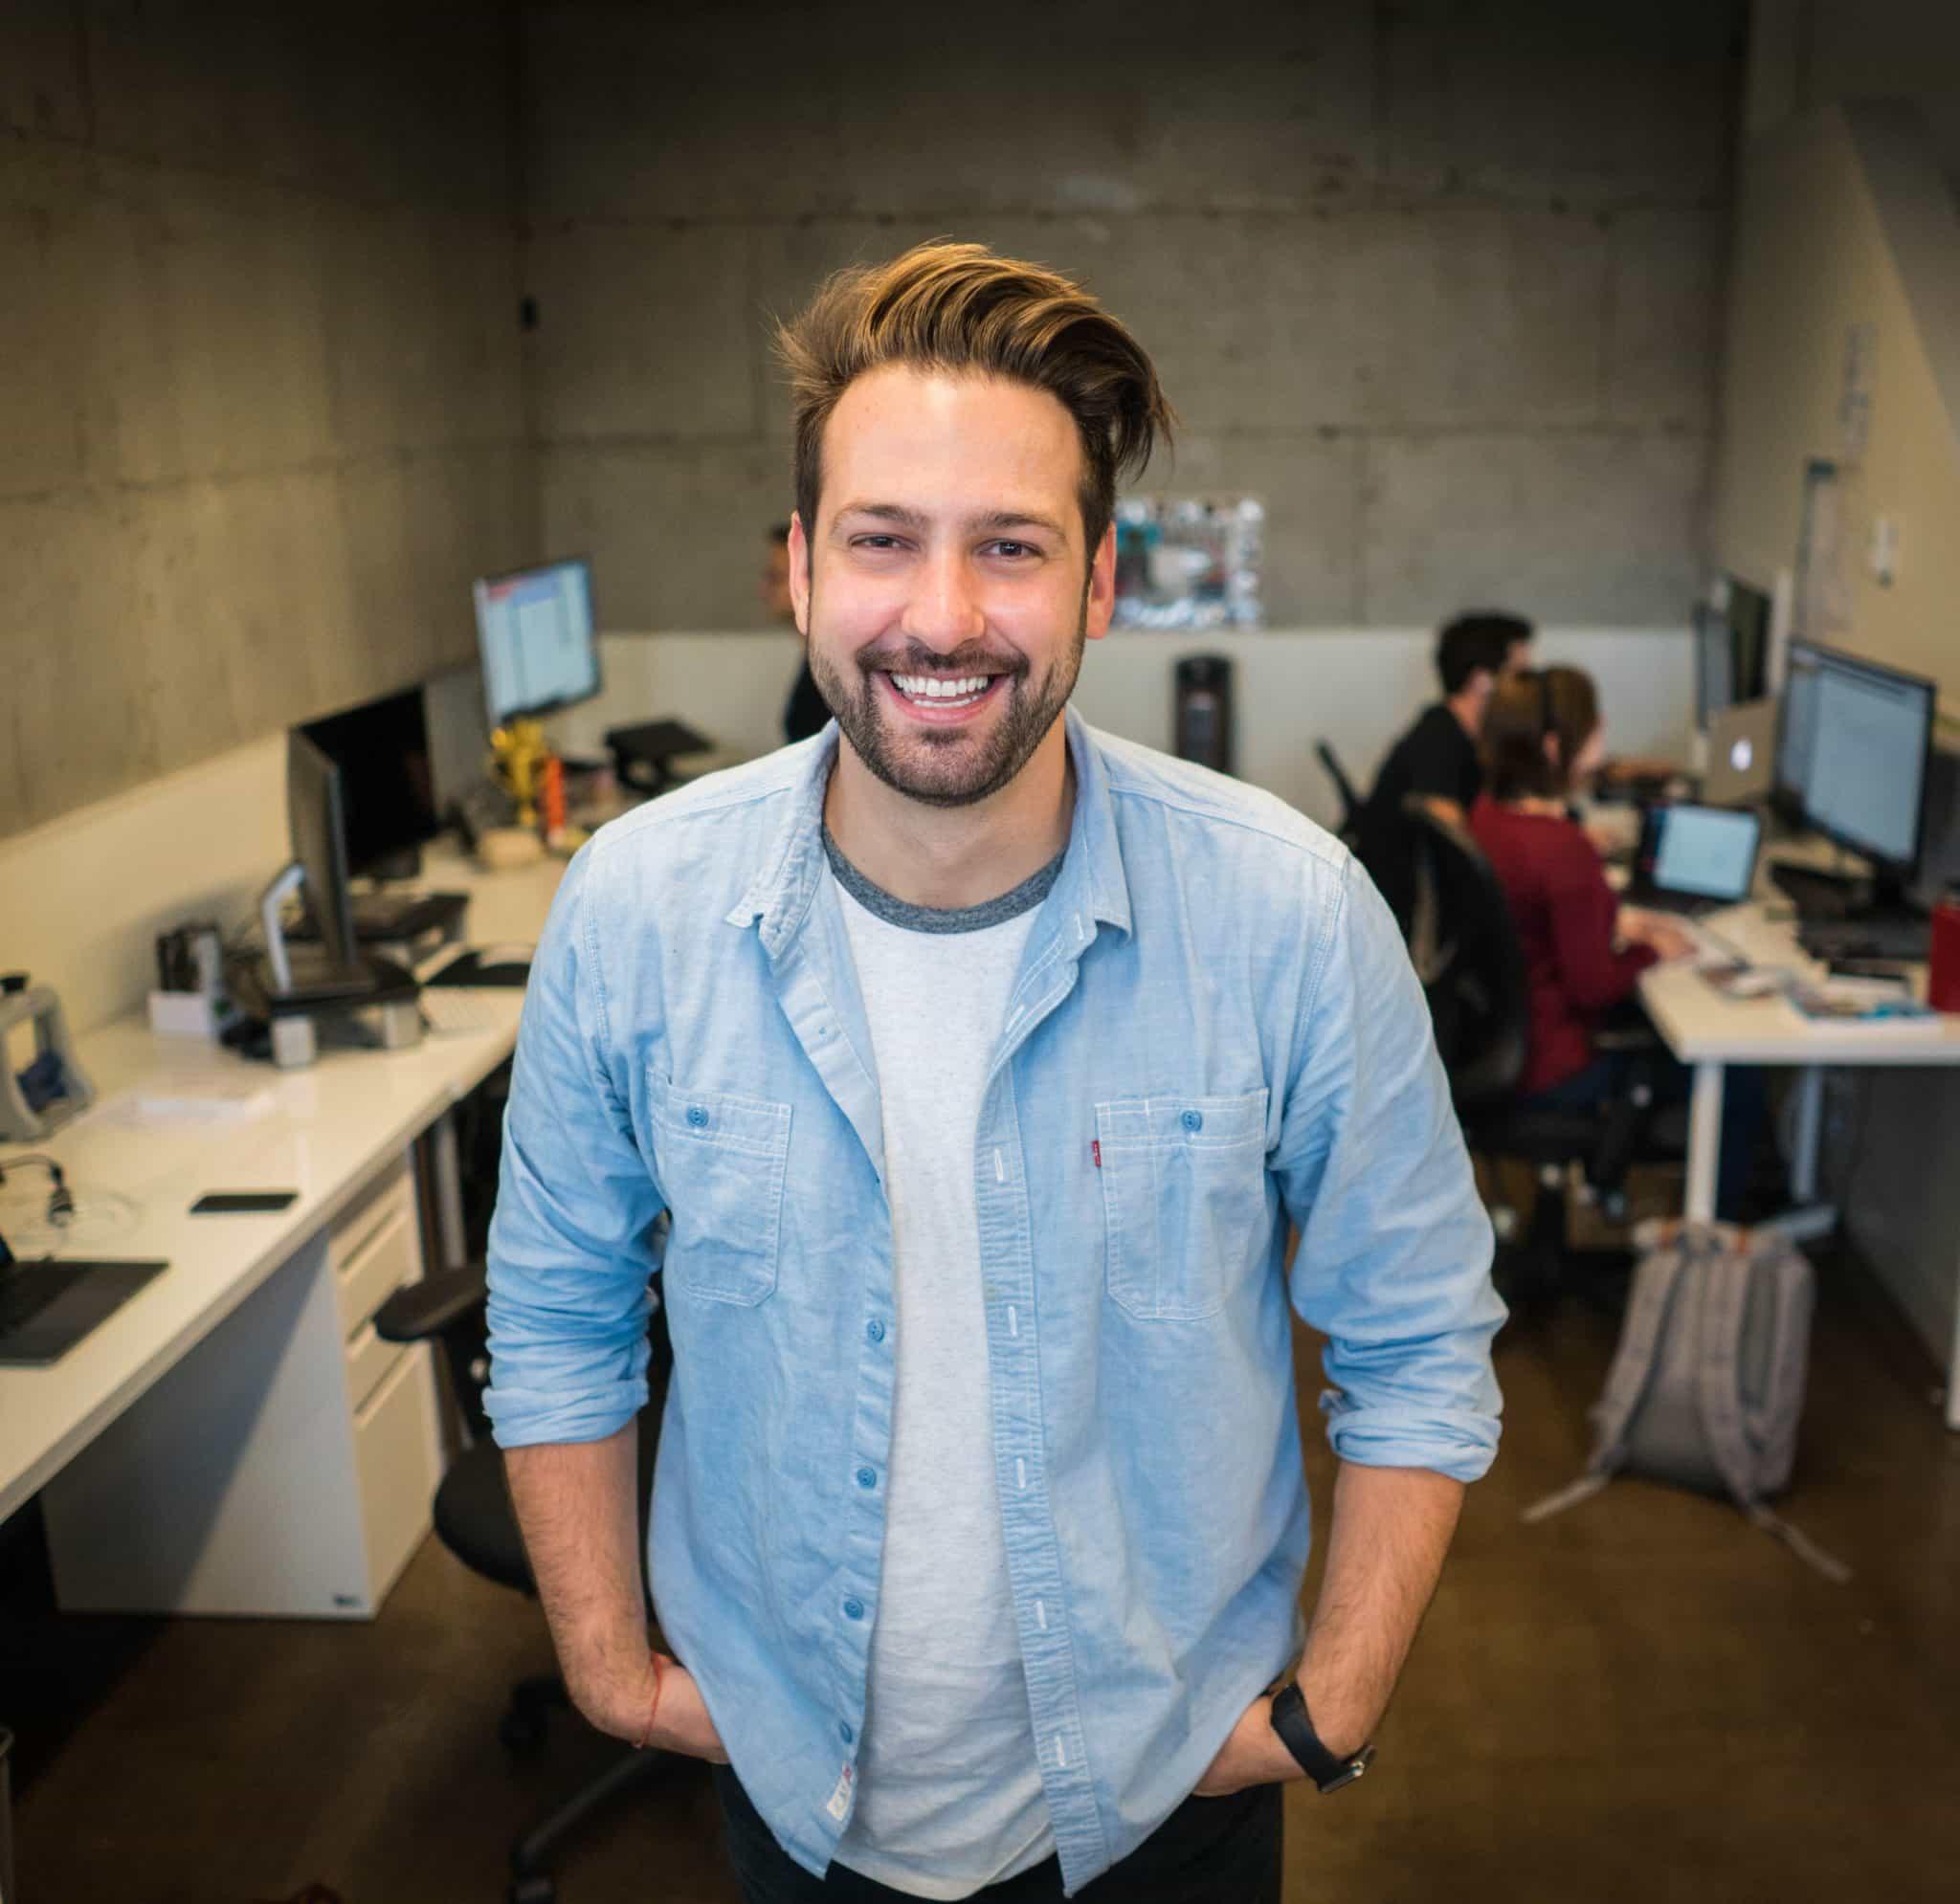 Agence web Marseille Création site internet Skill hunter cabinet de recrutement